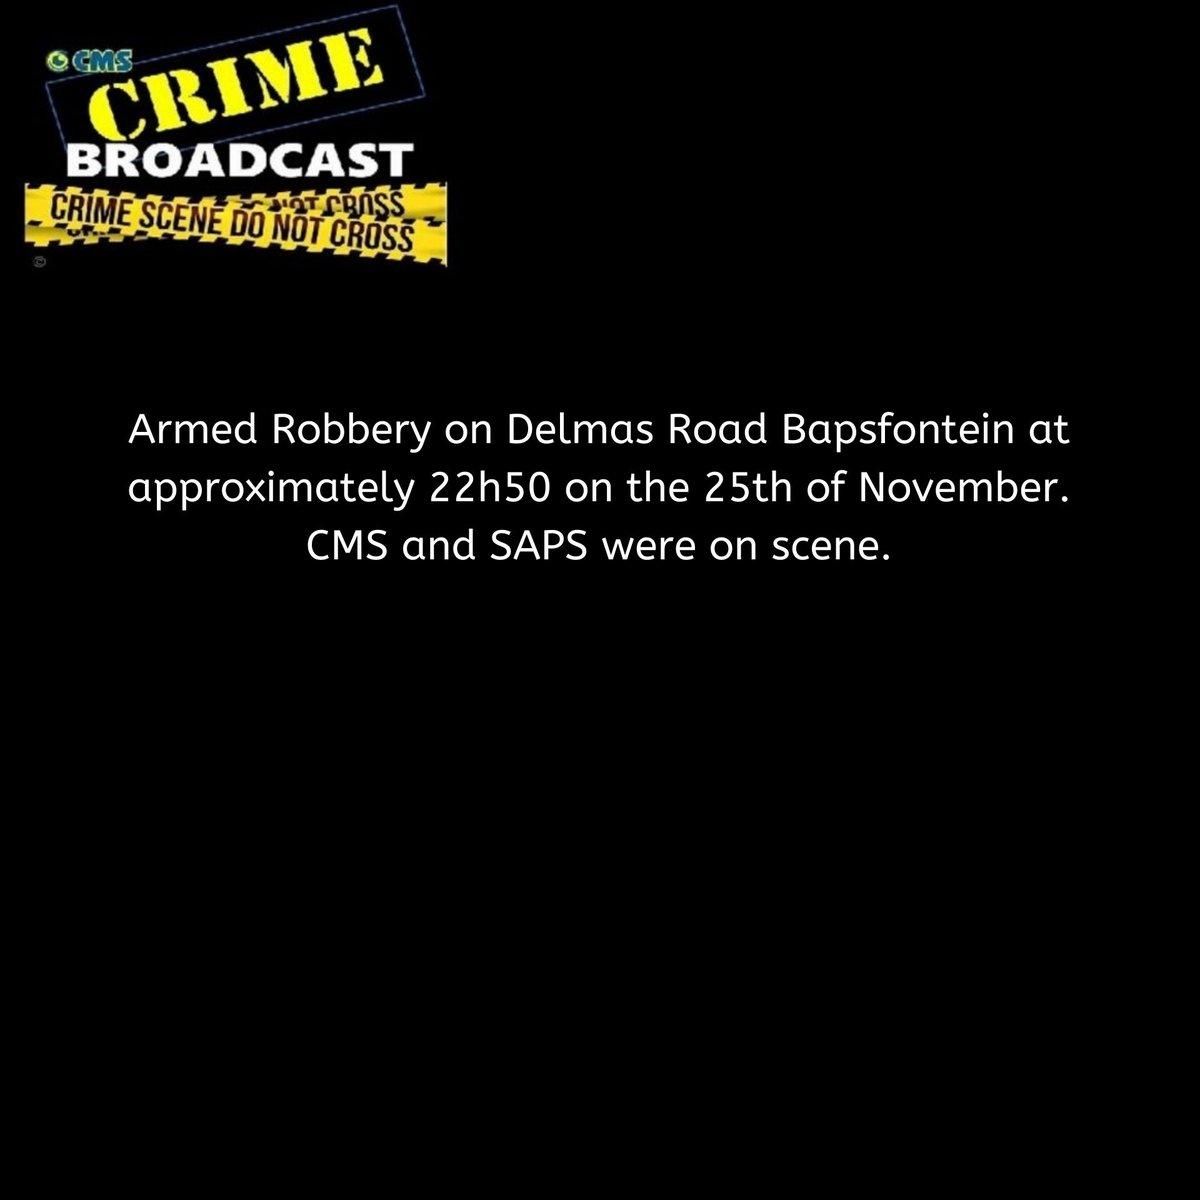 Crimebroadcast 2020-11-26 #CommunityRules #Safety  #proudlycms #Patrolling #Precincts #Ekurhuleni #Reaction #Closures #CommunityMonitoringServices https://t.co/5e8kdFPwBr